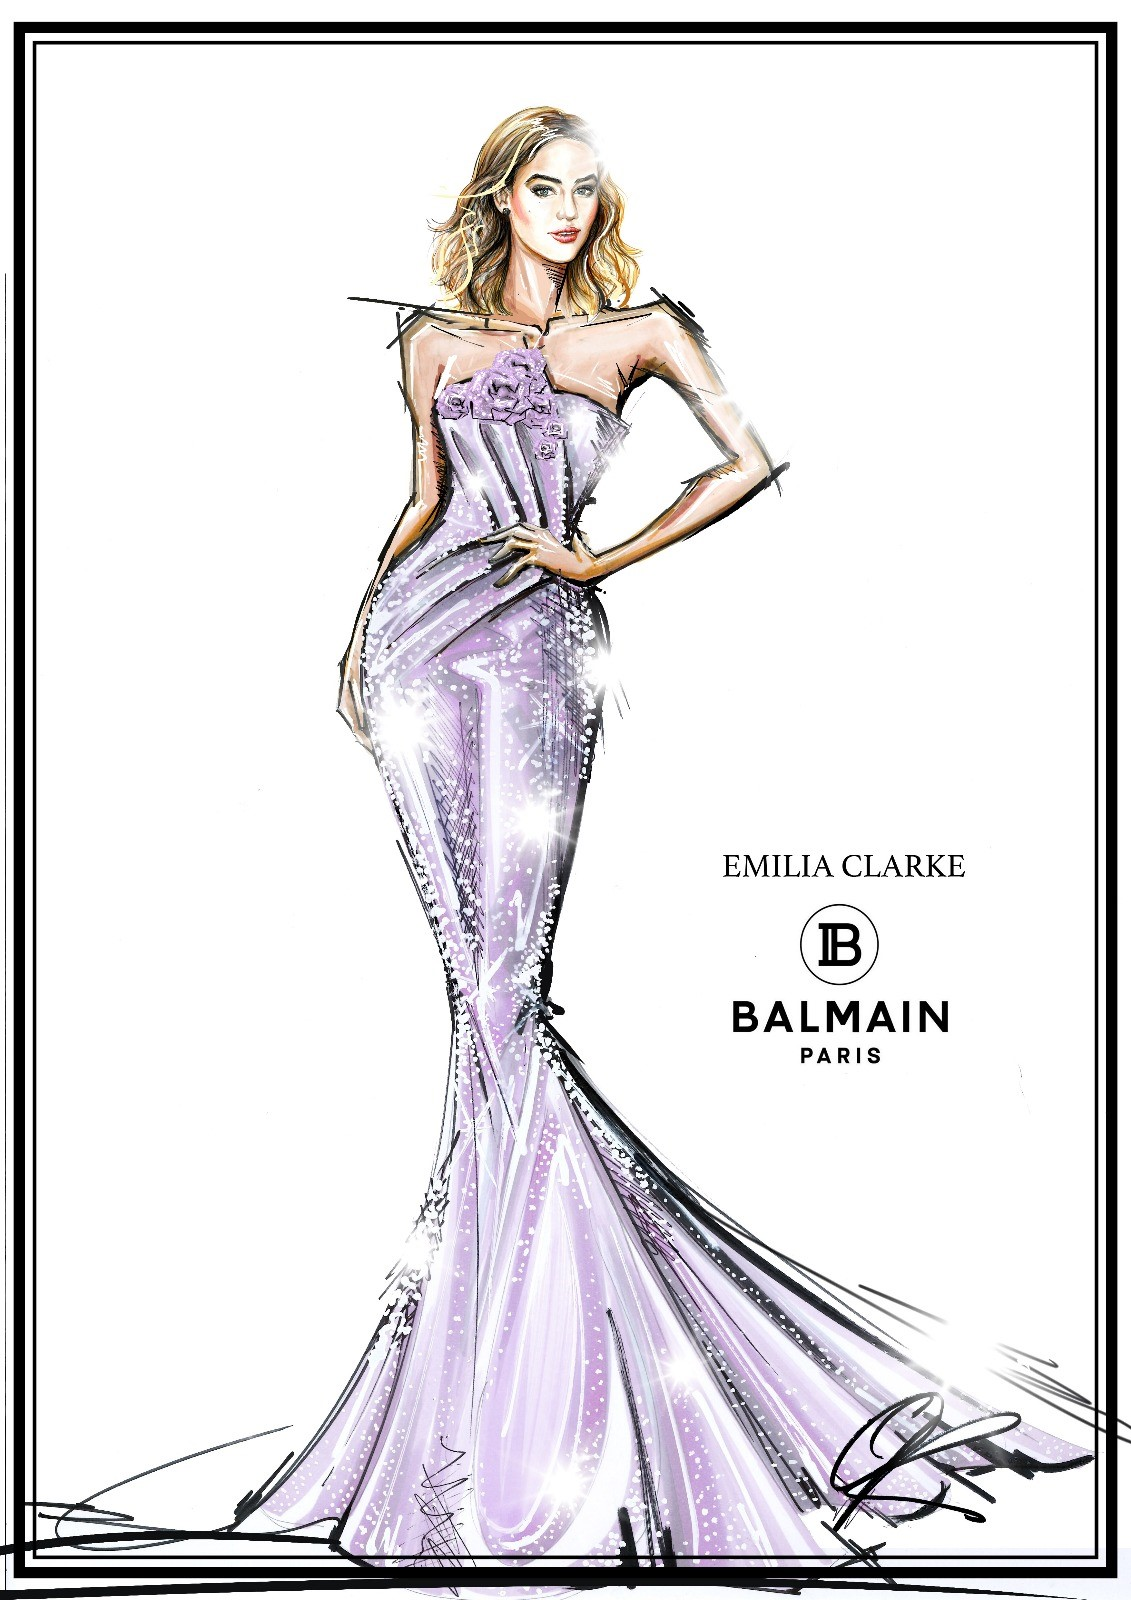 Emilia Clarke x Swarovski Balmain Sketch.jpg